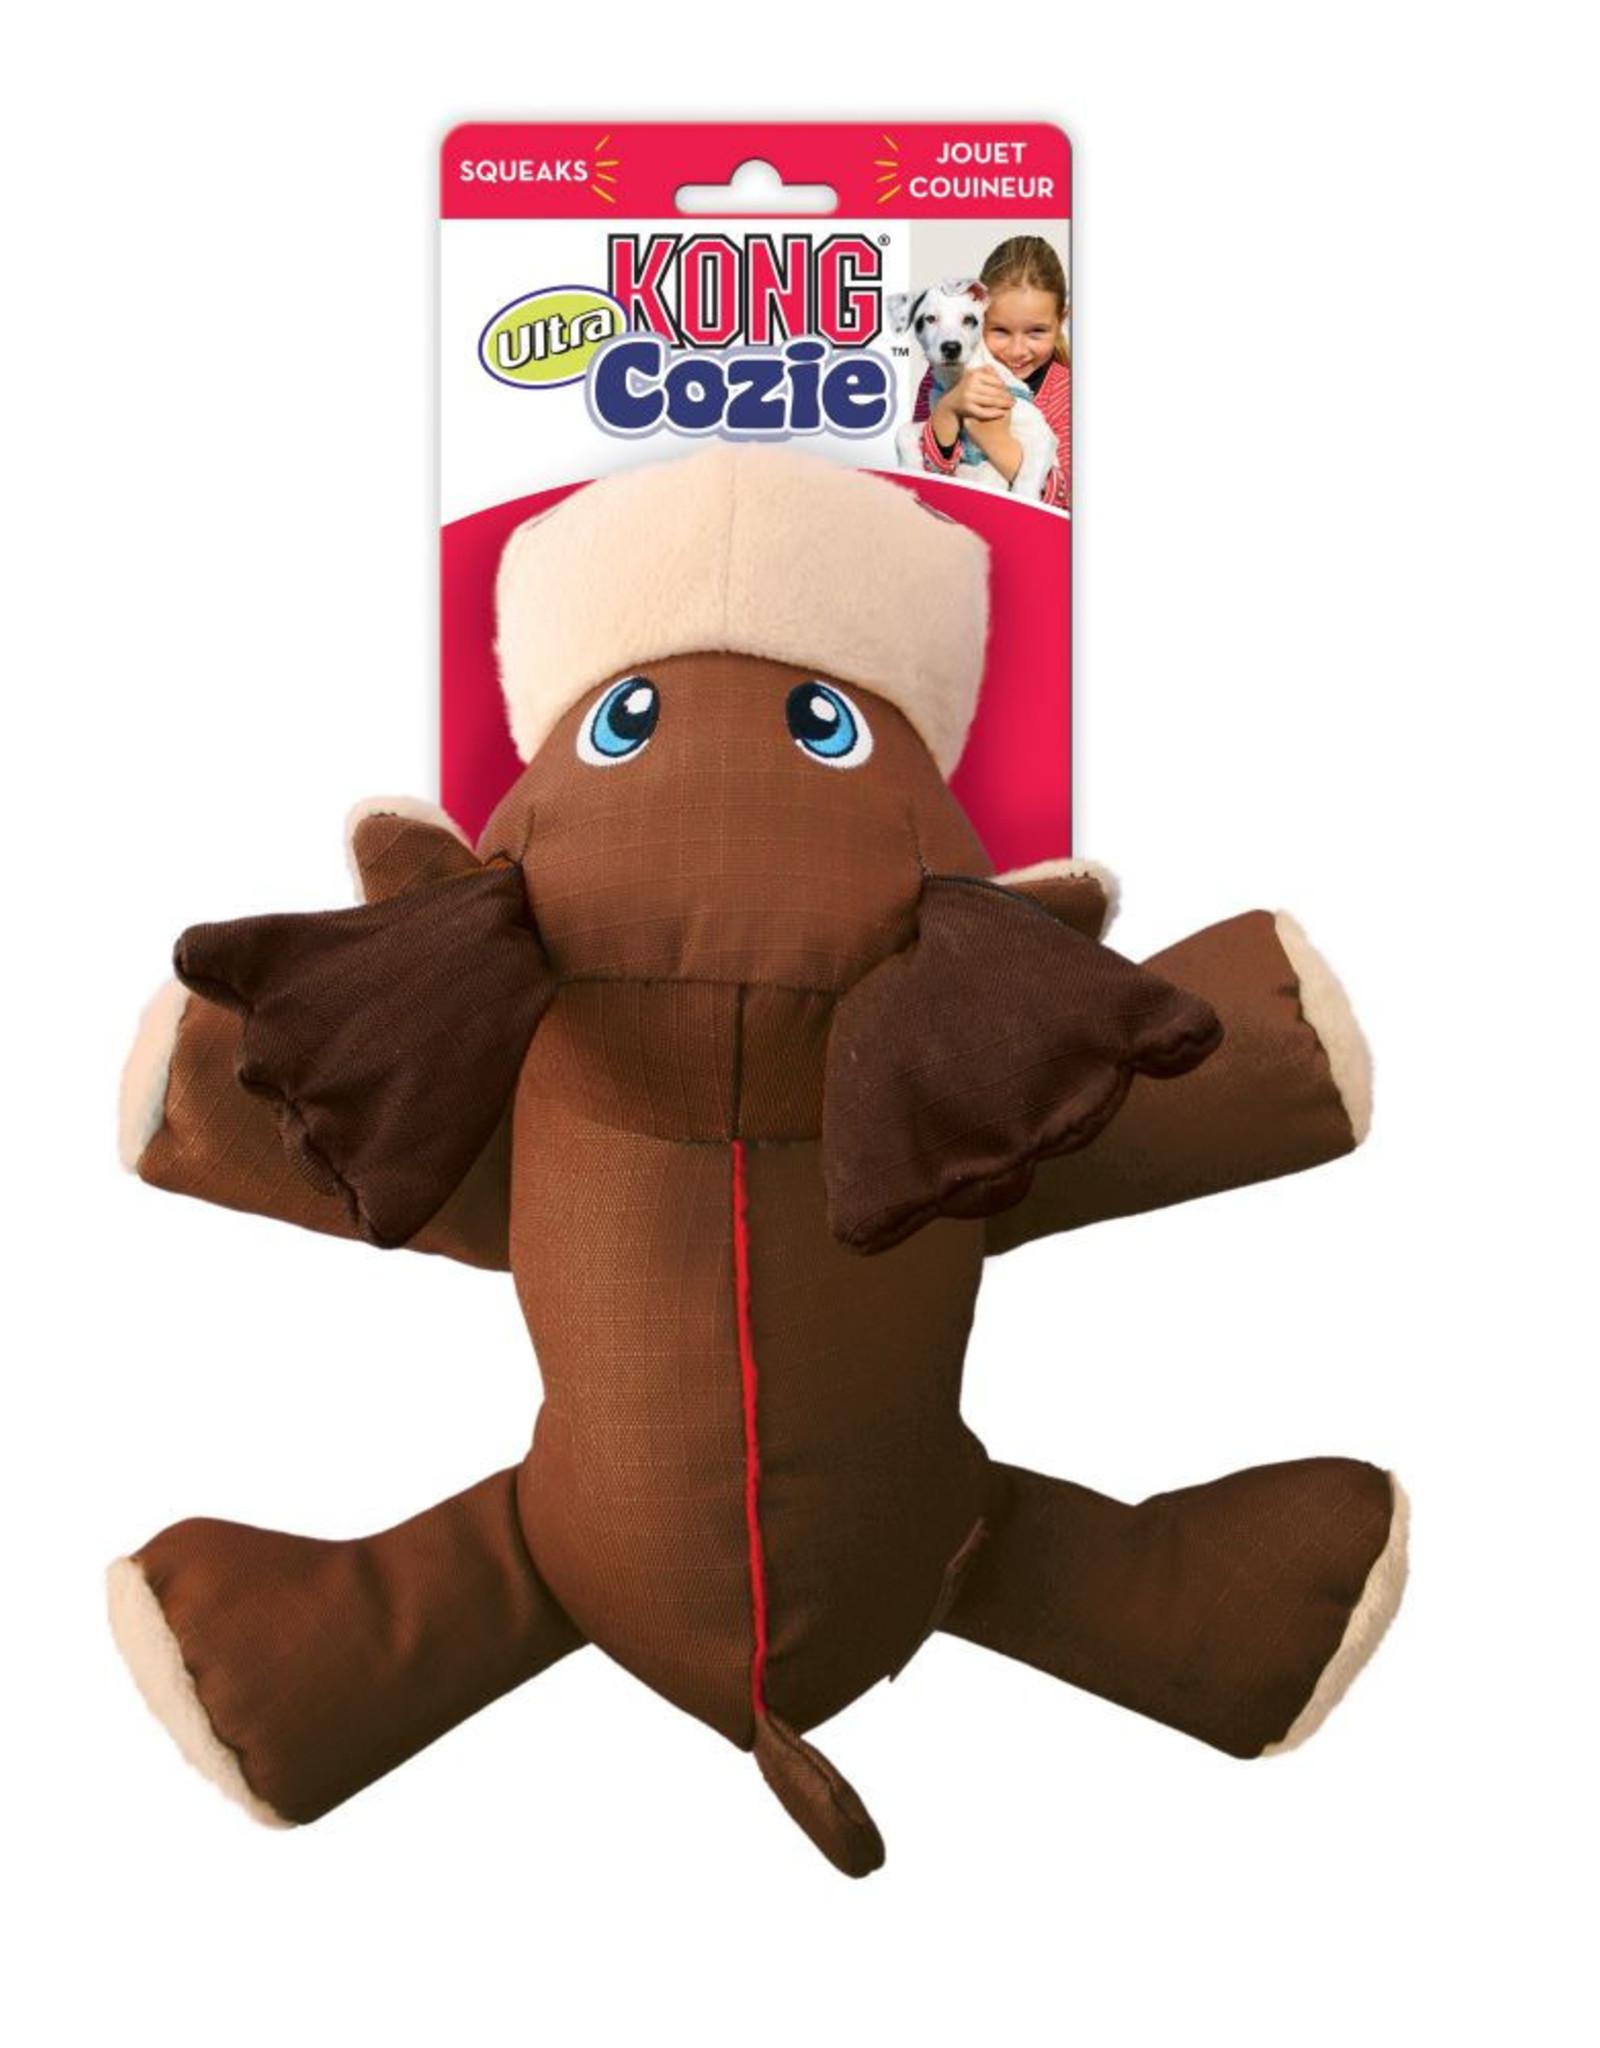 KONG Cozie Ultra Max Moose Dog Toy, Medium